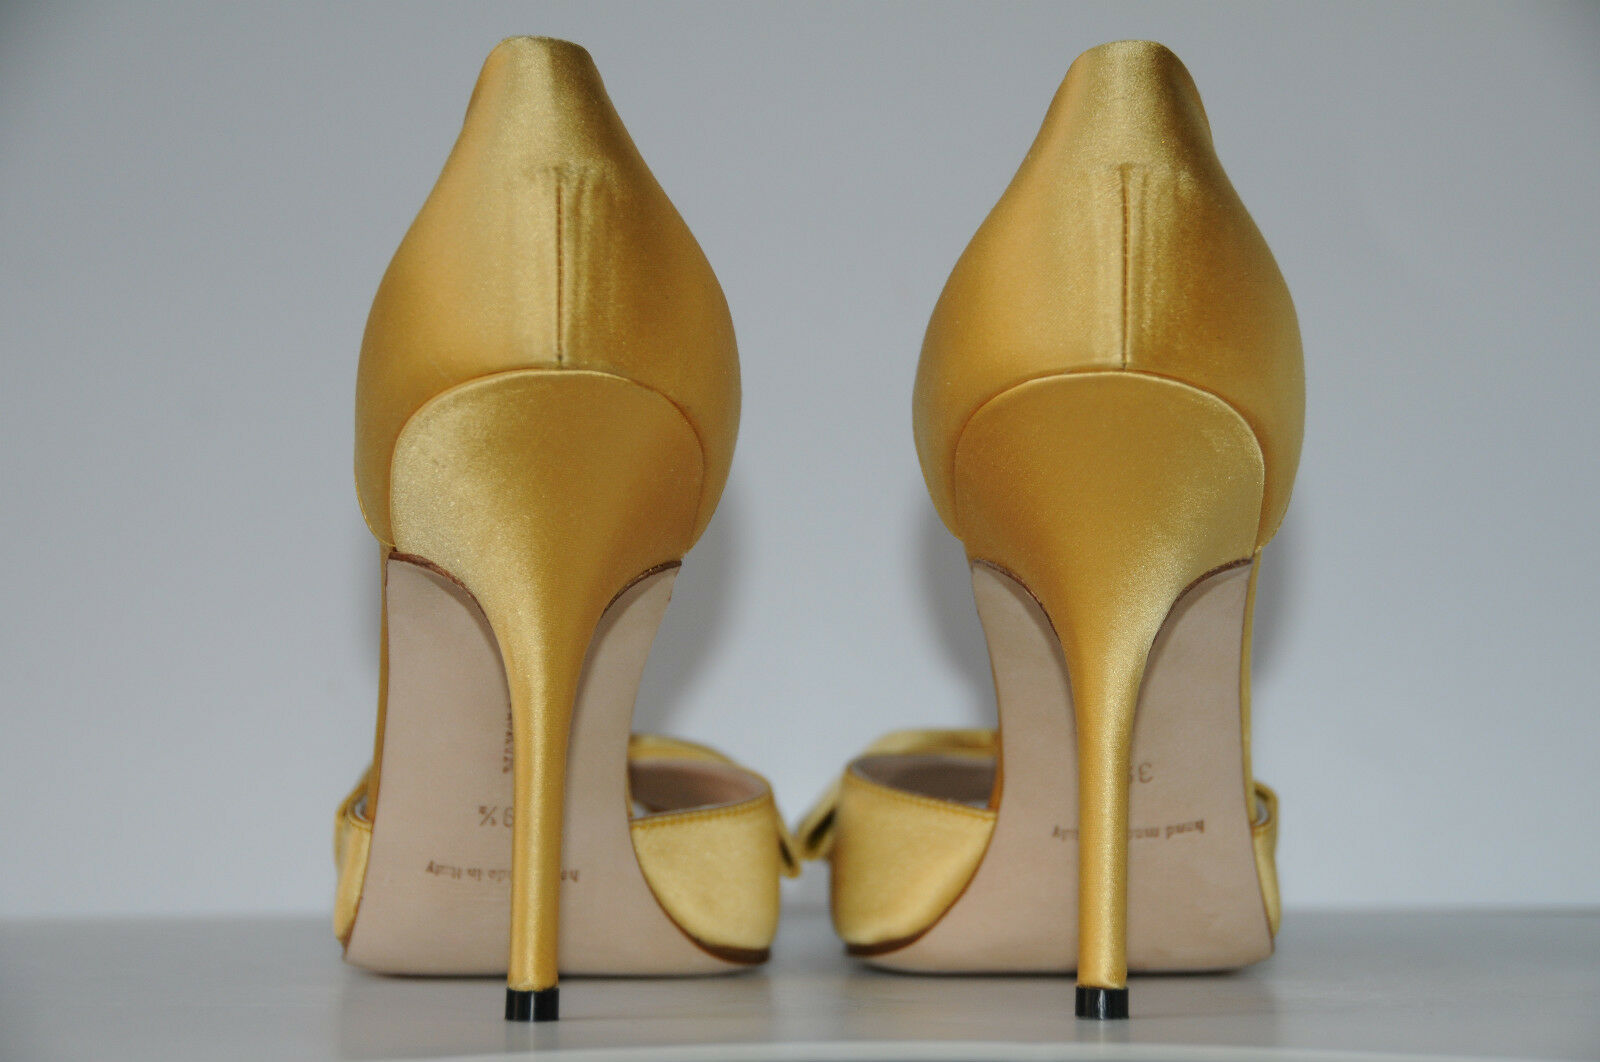 775 New MANOLO BLAHNIK CLAUSADO jaune SATIN EVENING chaussures 40 9.5 Wedding f87b13